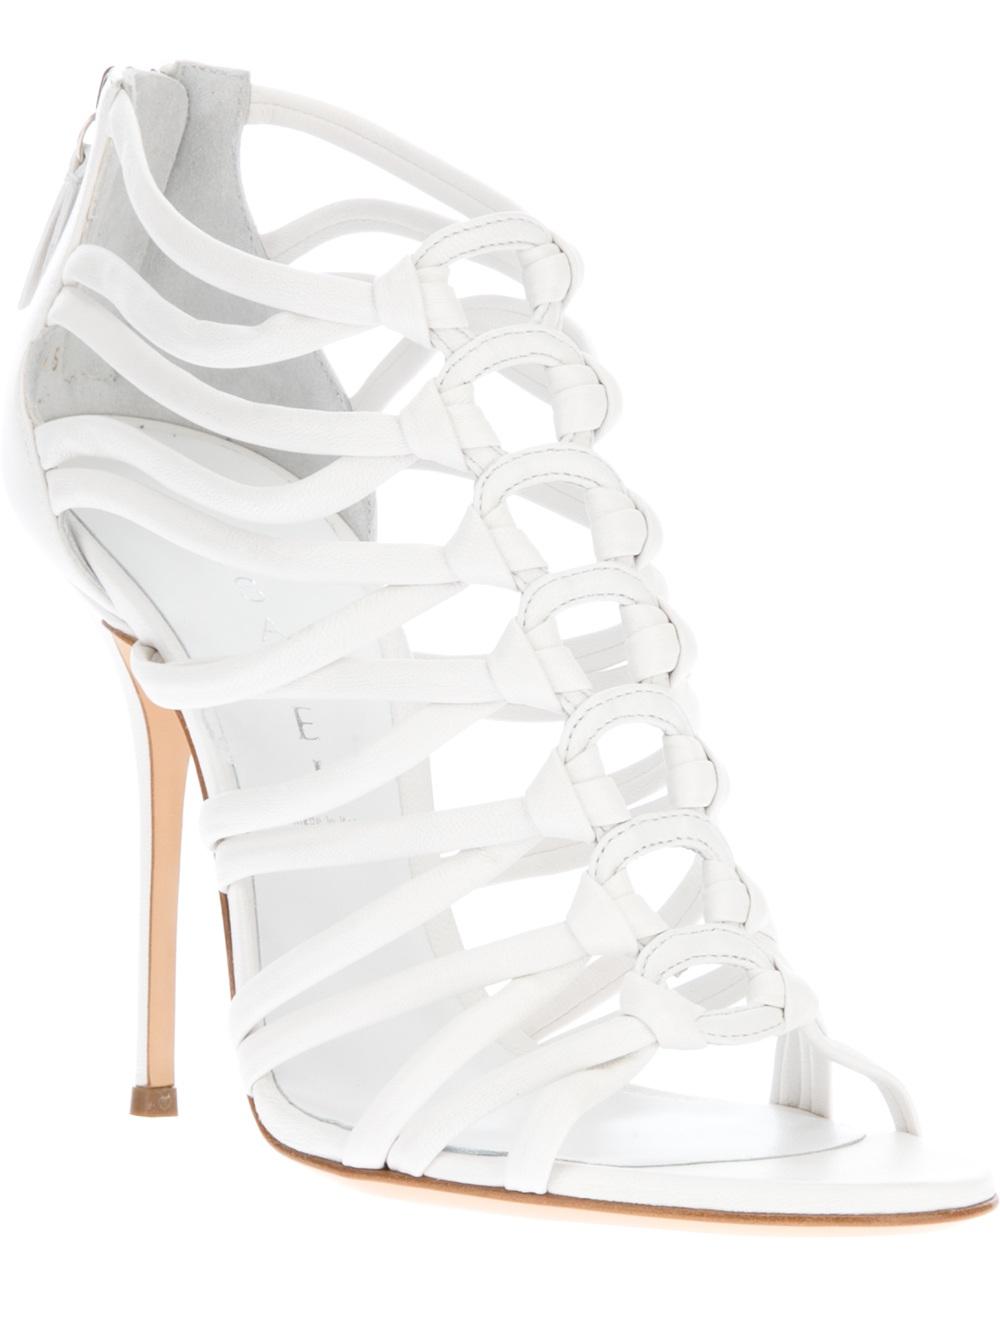 Casadei Strappy Stiletto Sandal in White | Lyst